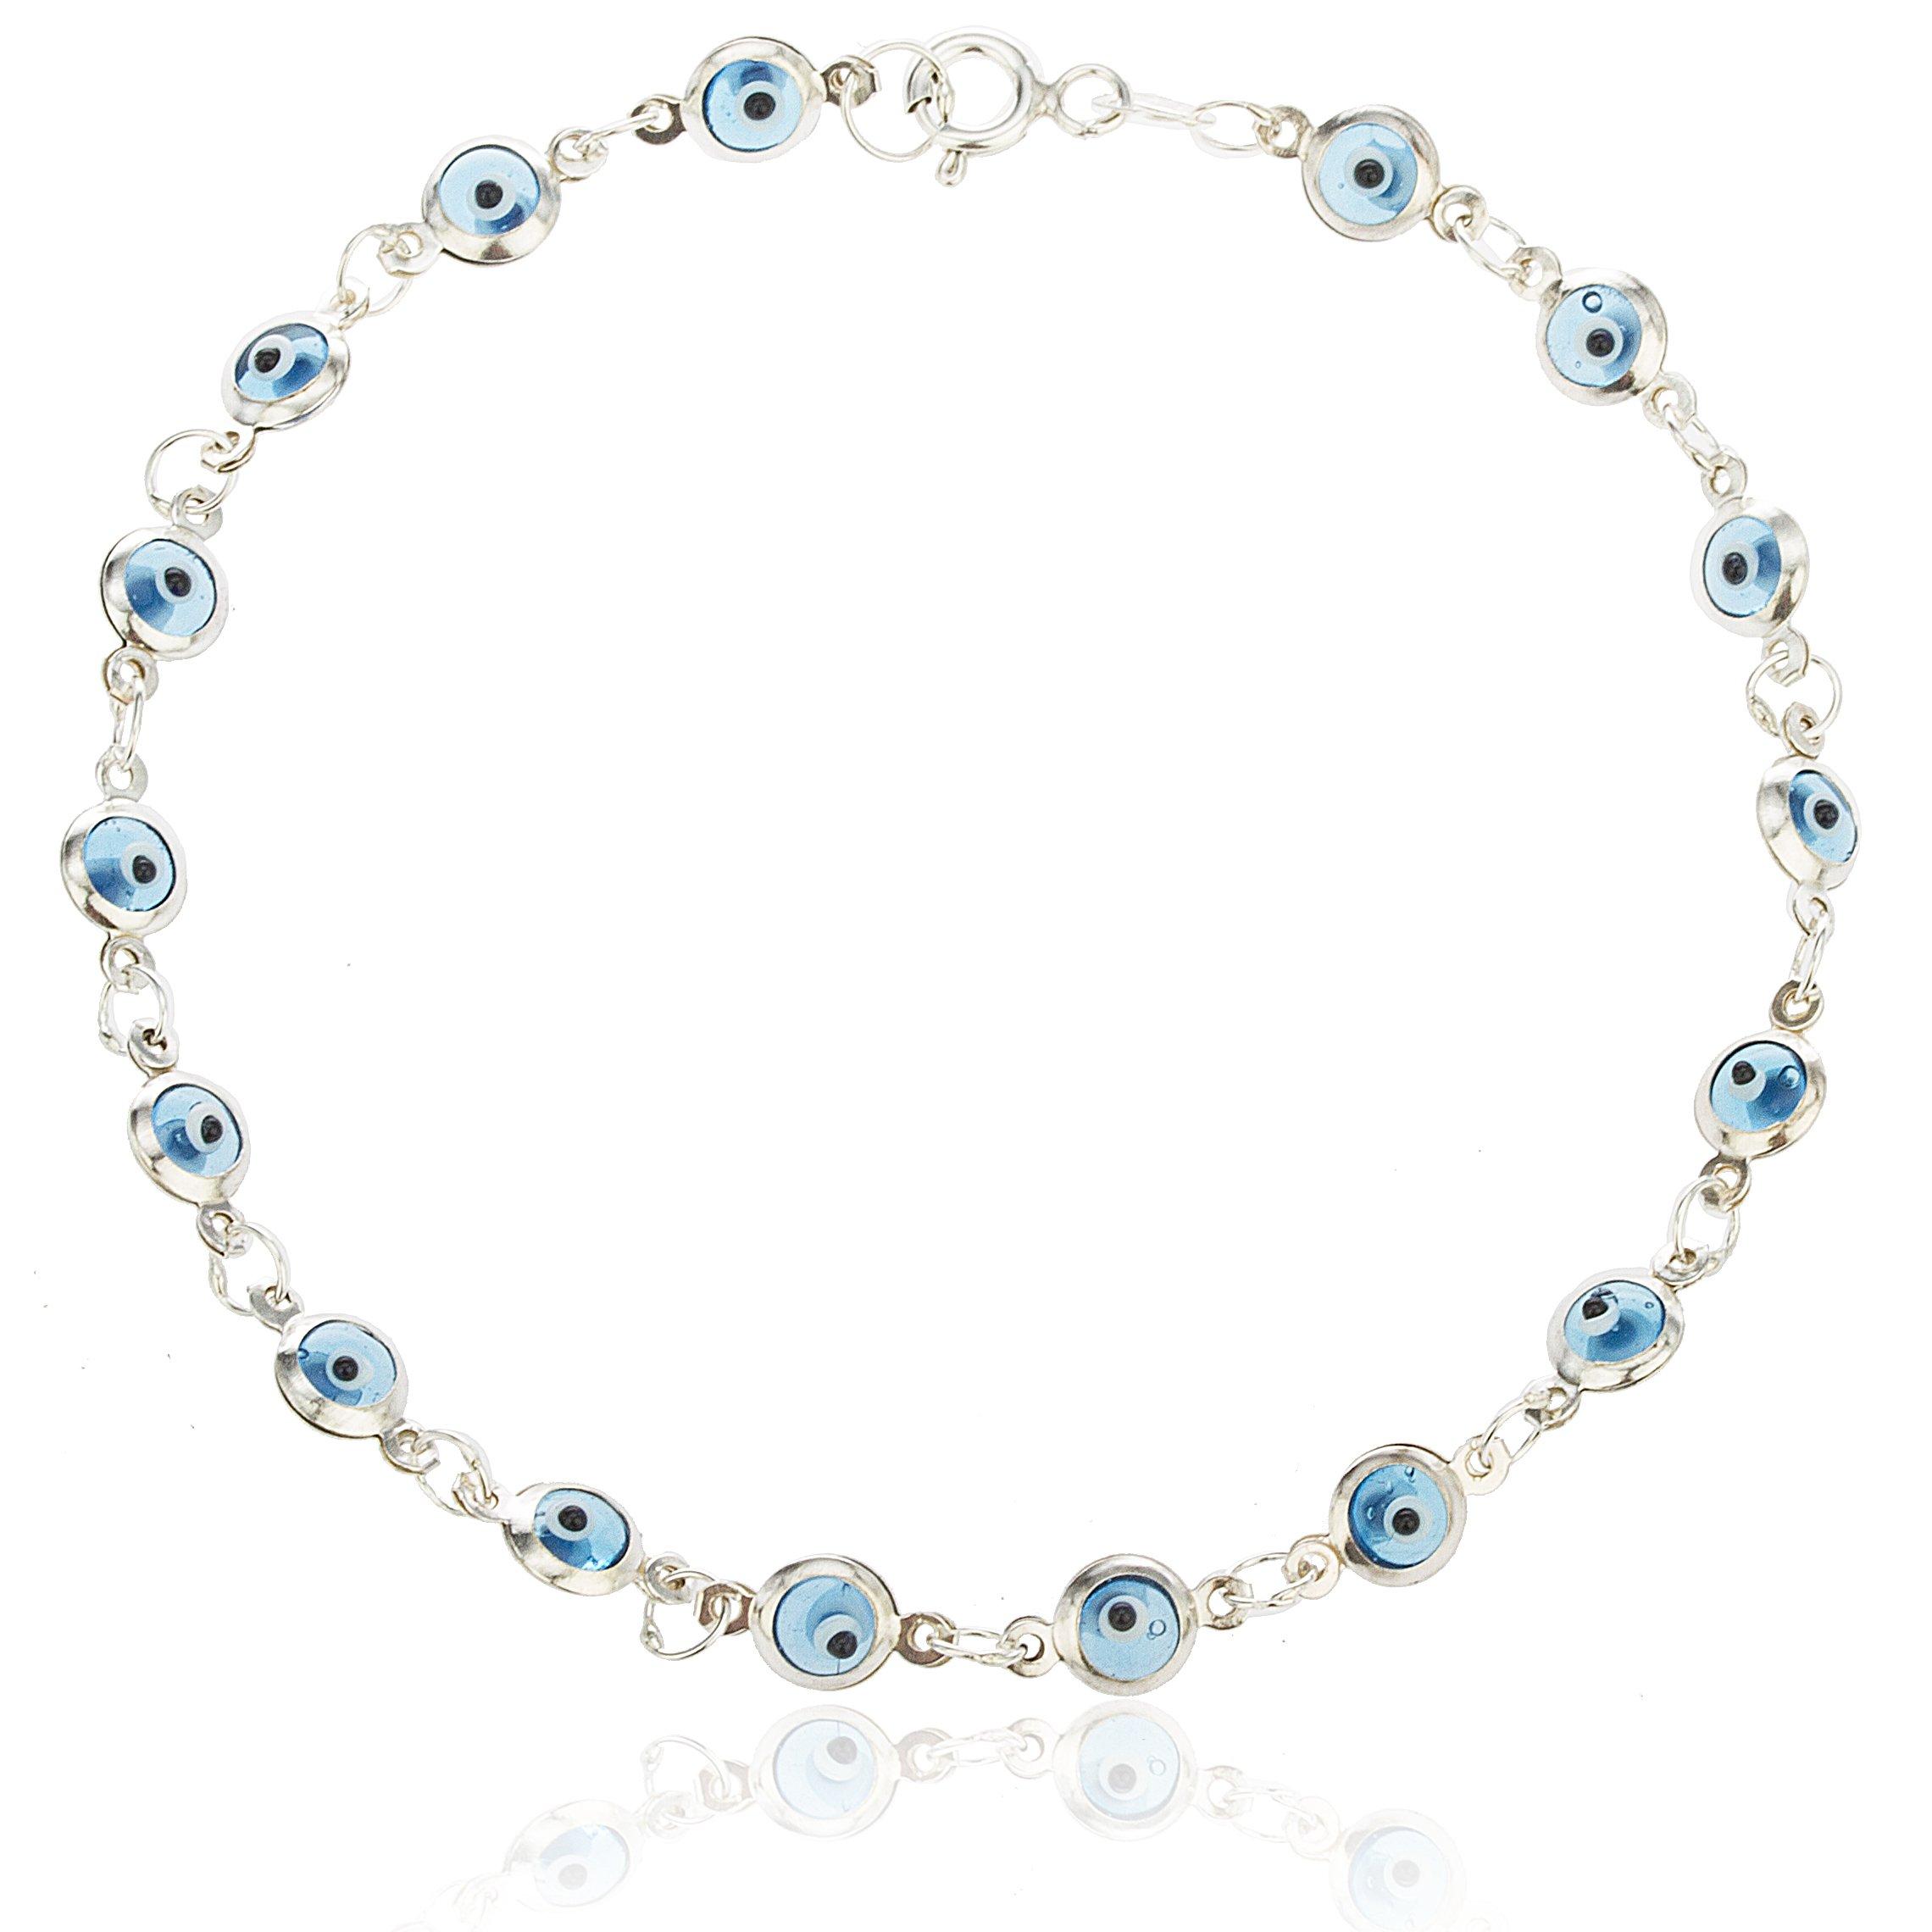 925 Sterling Silver with Aqua Blue Evil Eye Charmed 7 Inch Bracelet..(I-1956)